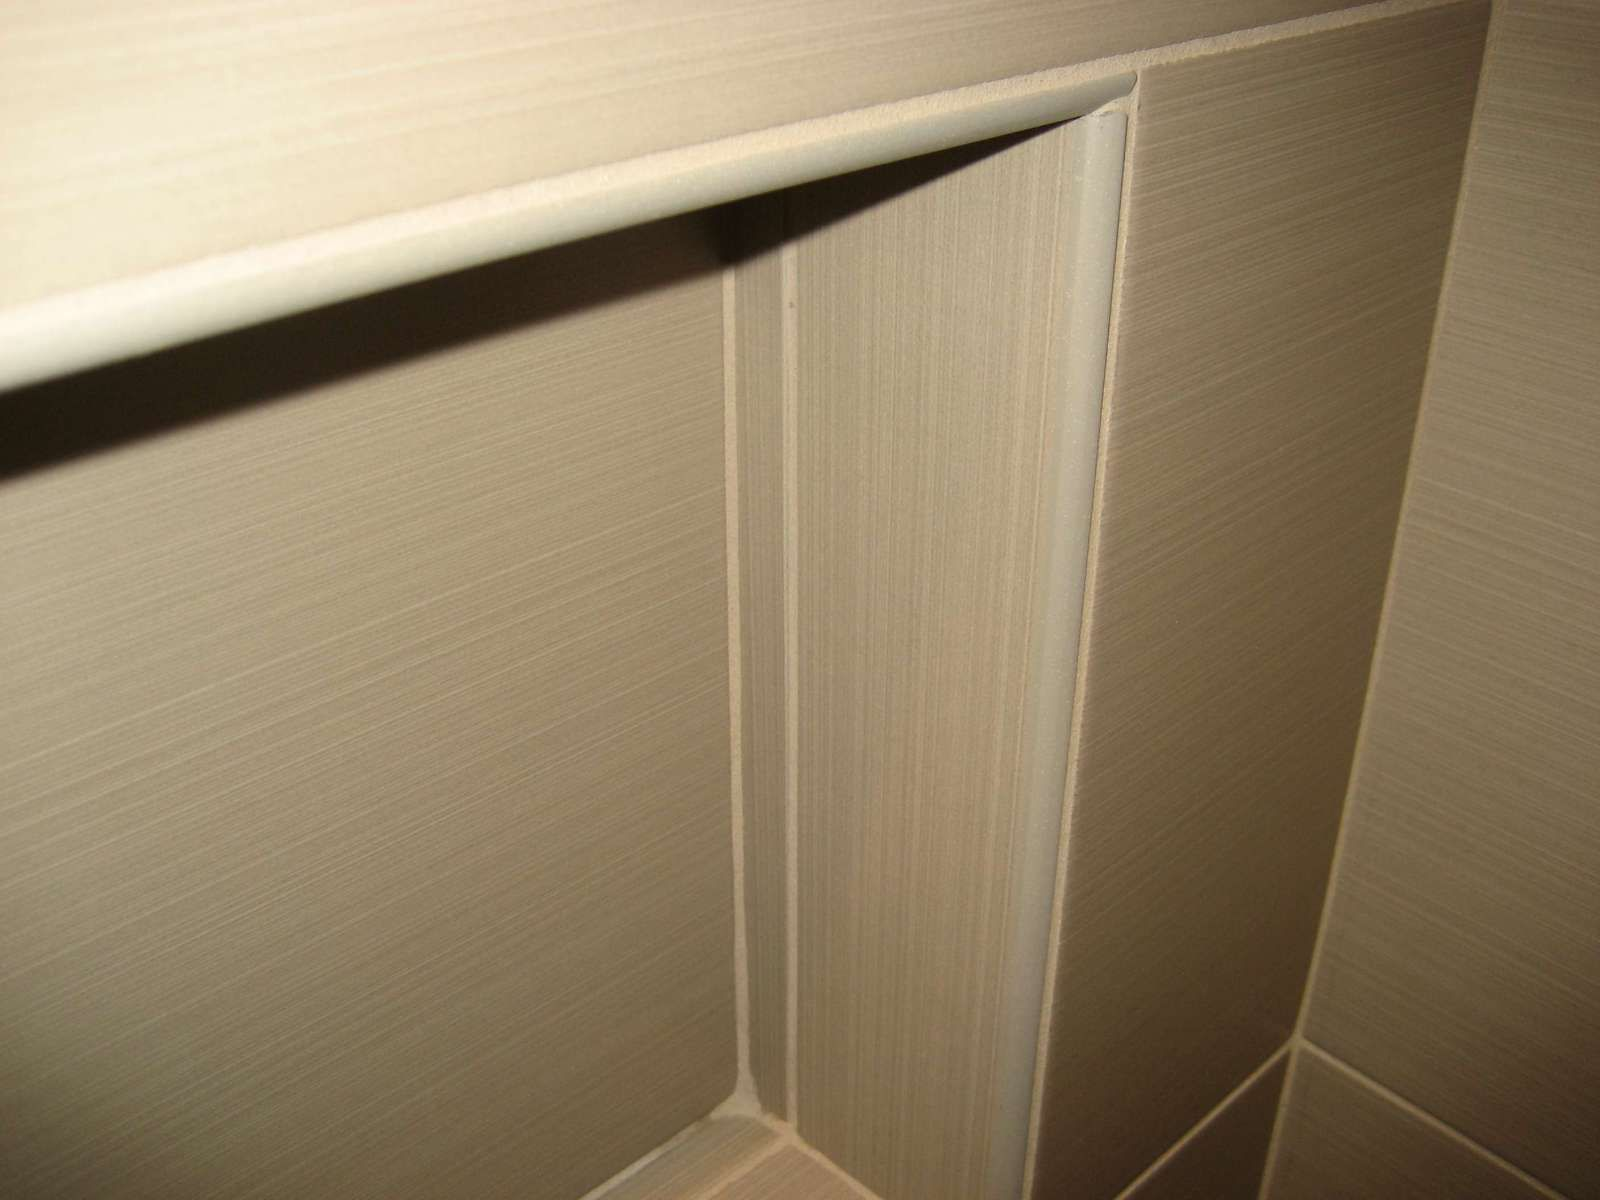 schluter jolly edge trim in contemporary shower | Bathroom & Home ...